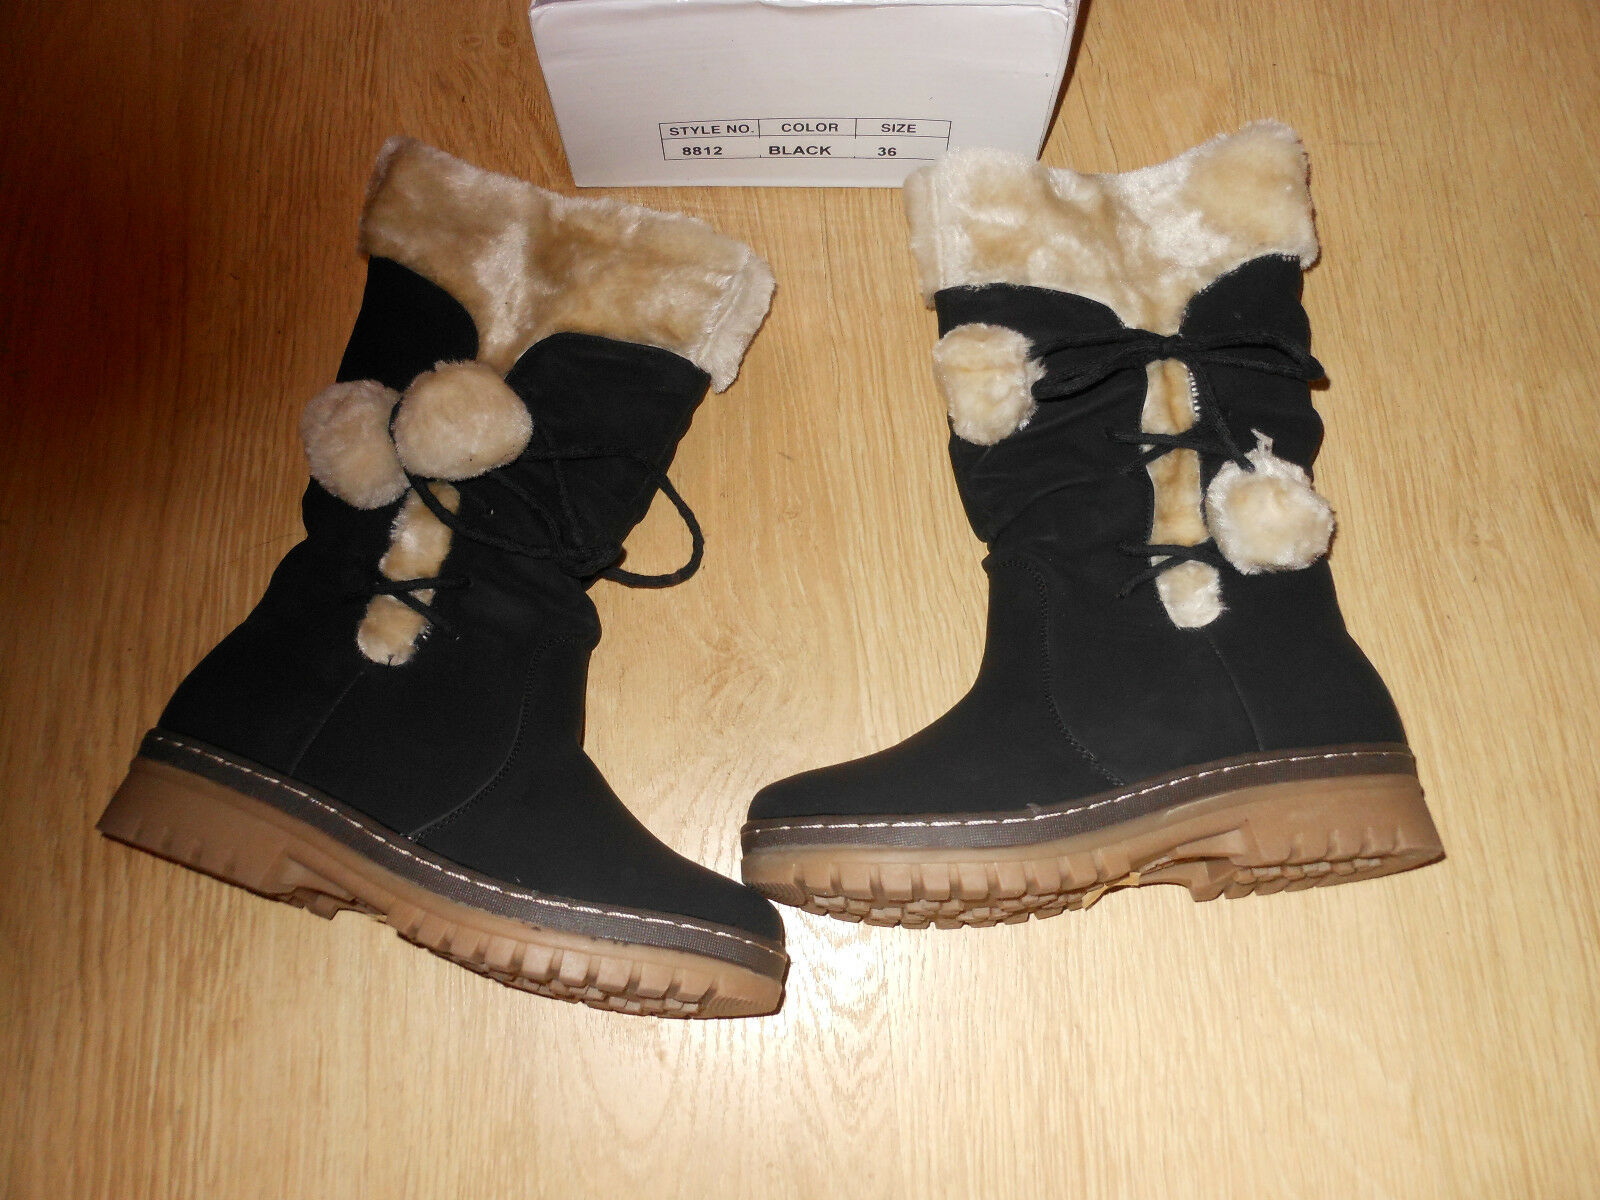 BNIB Winter Fur Lined Boots In Size 3 Eu 36